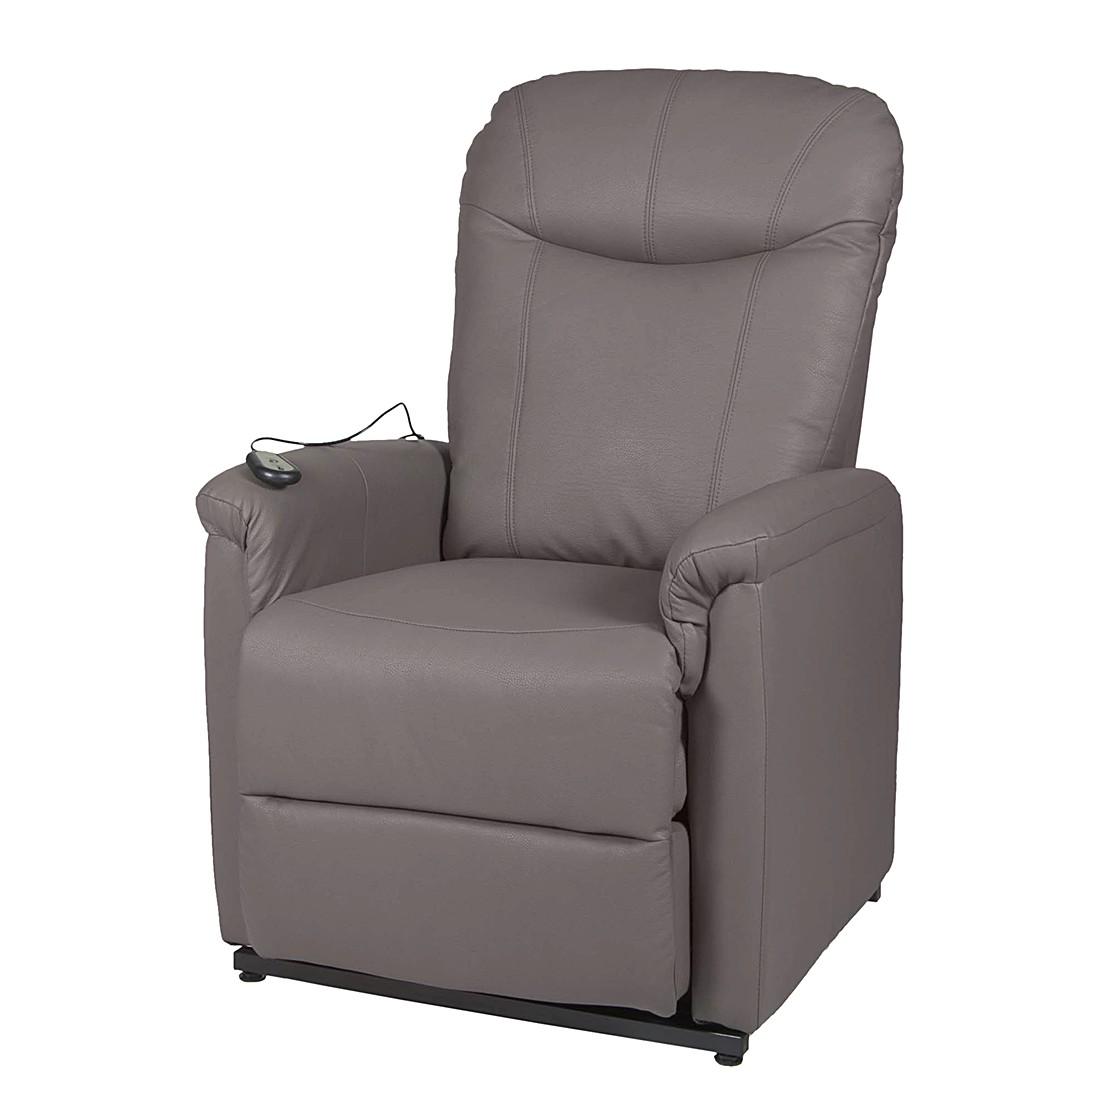 relaxsessel baltrum mit motor aufstehhilfe macchiato. Black Bedroom Furniture Sets. Home Design Ideas